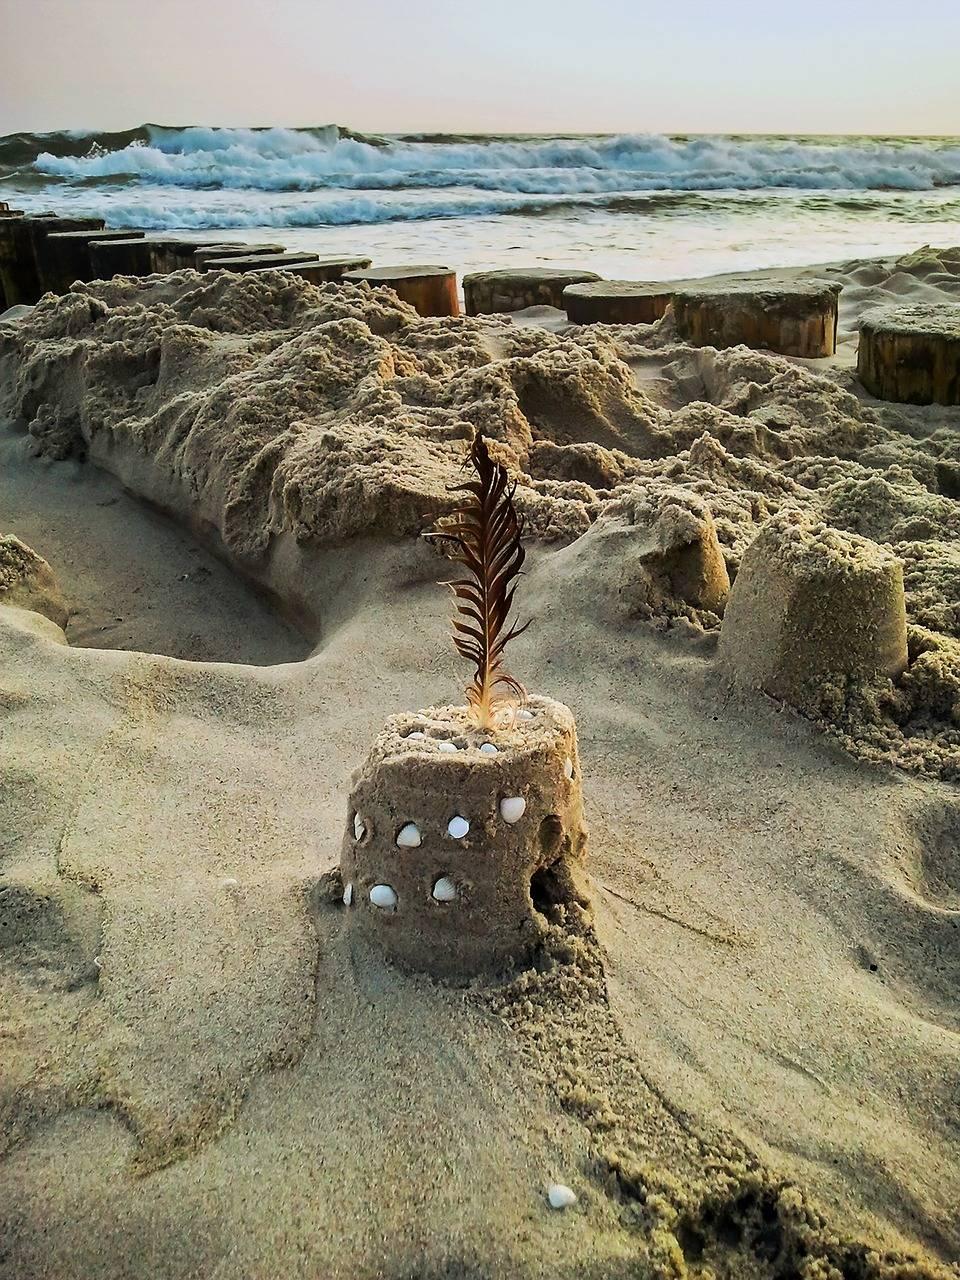 Sunnylife Blog 7 Spontaneous Beach Day Activities